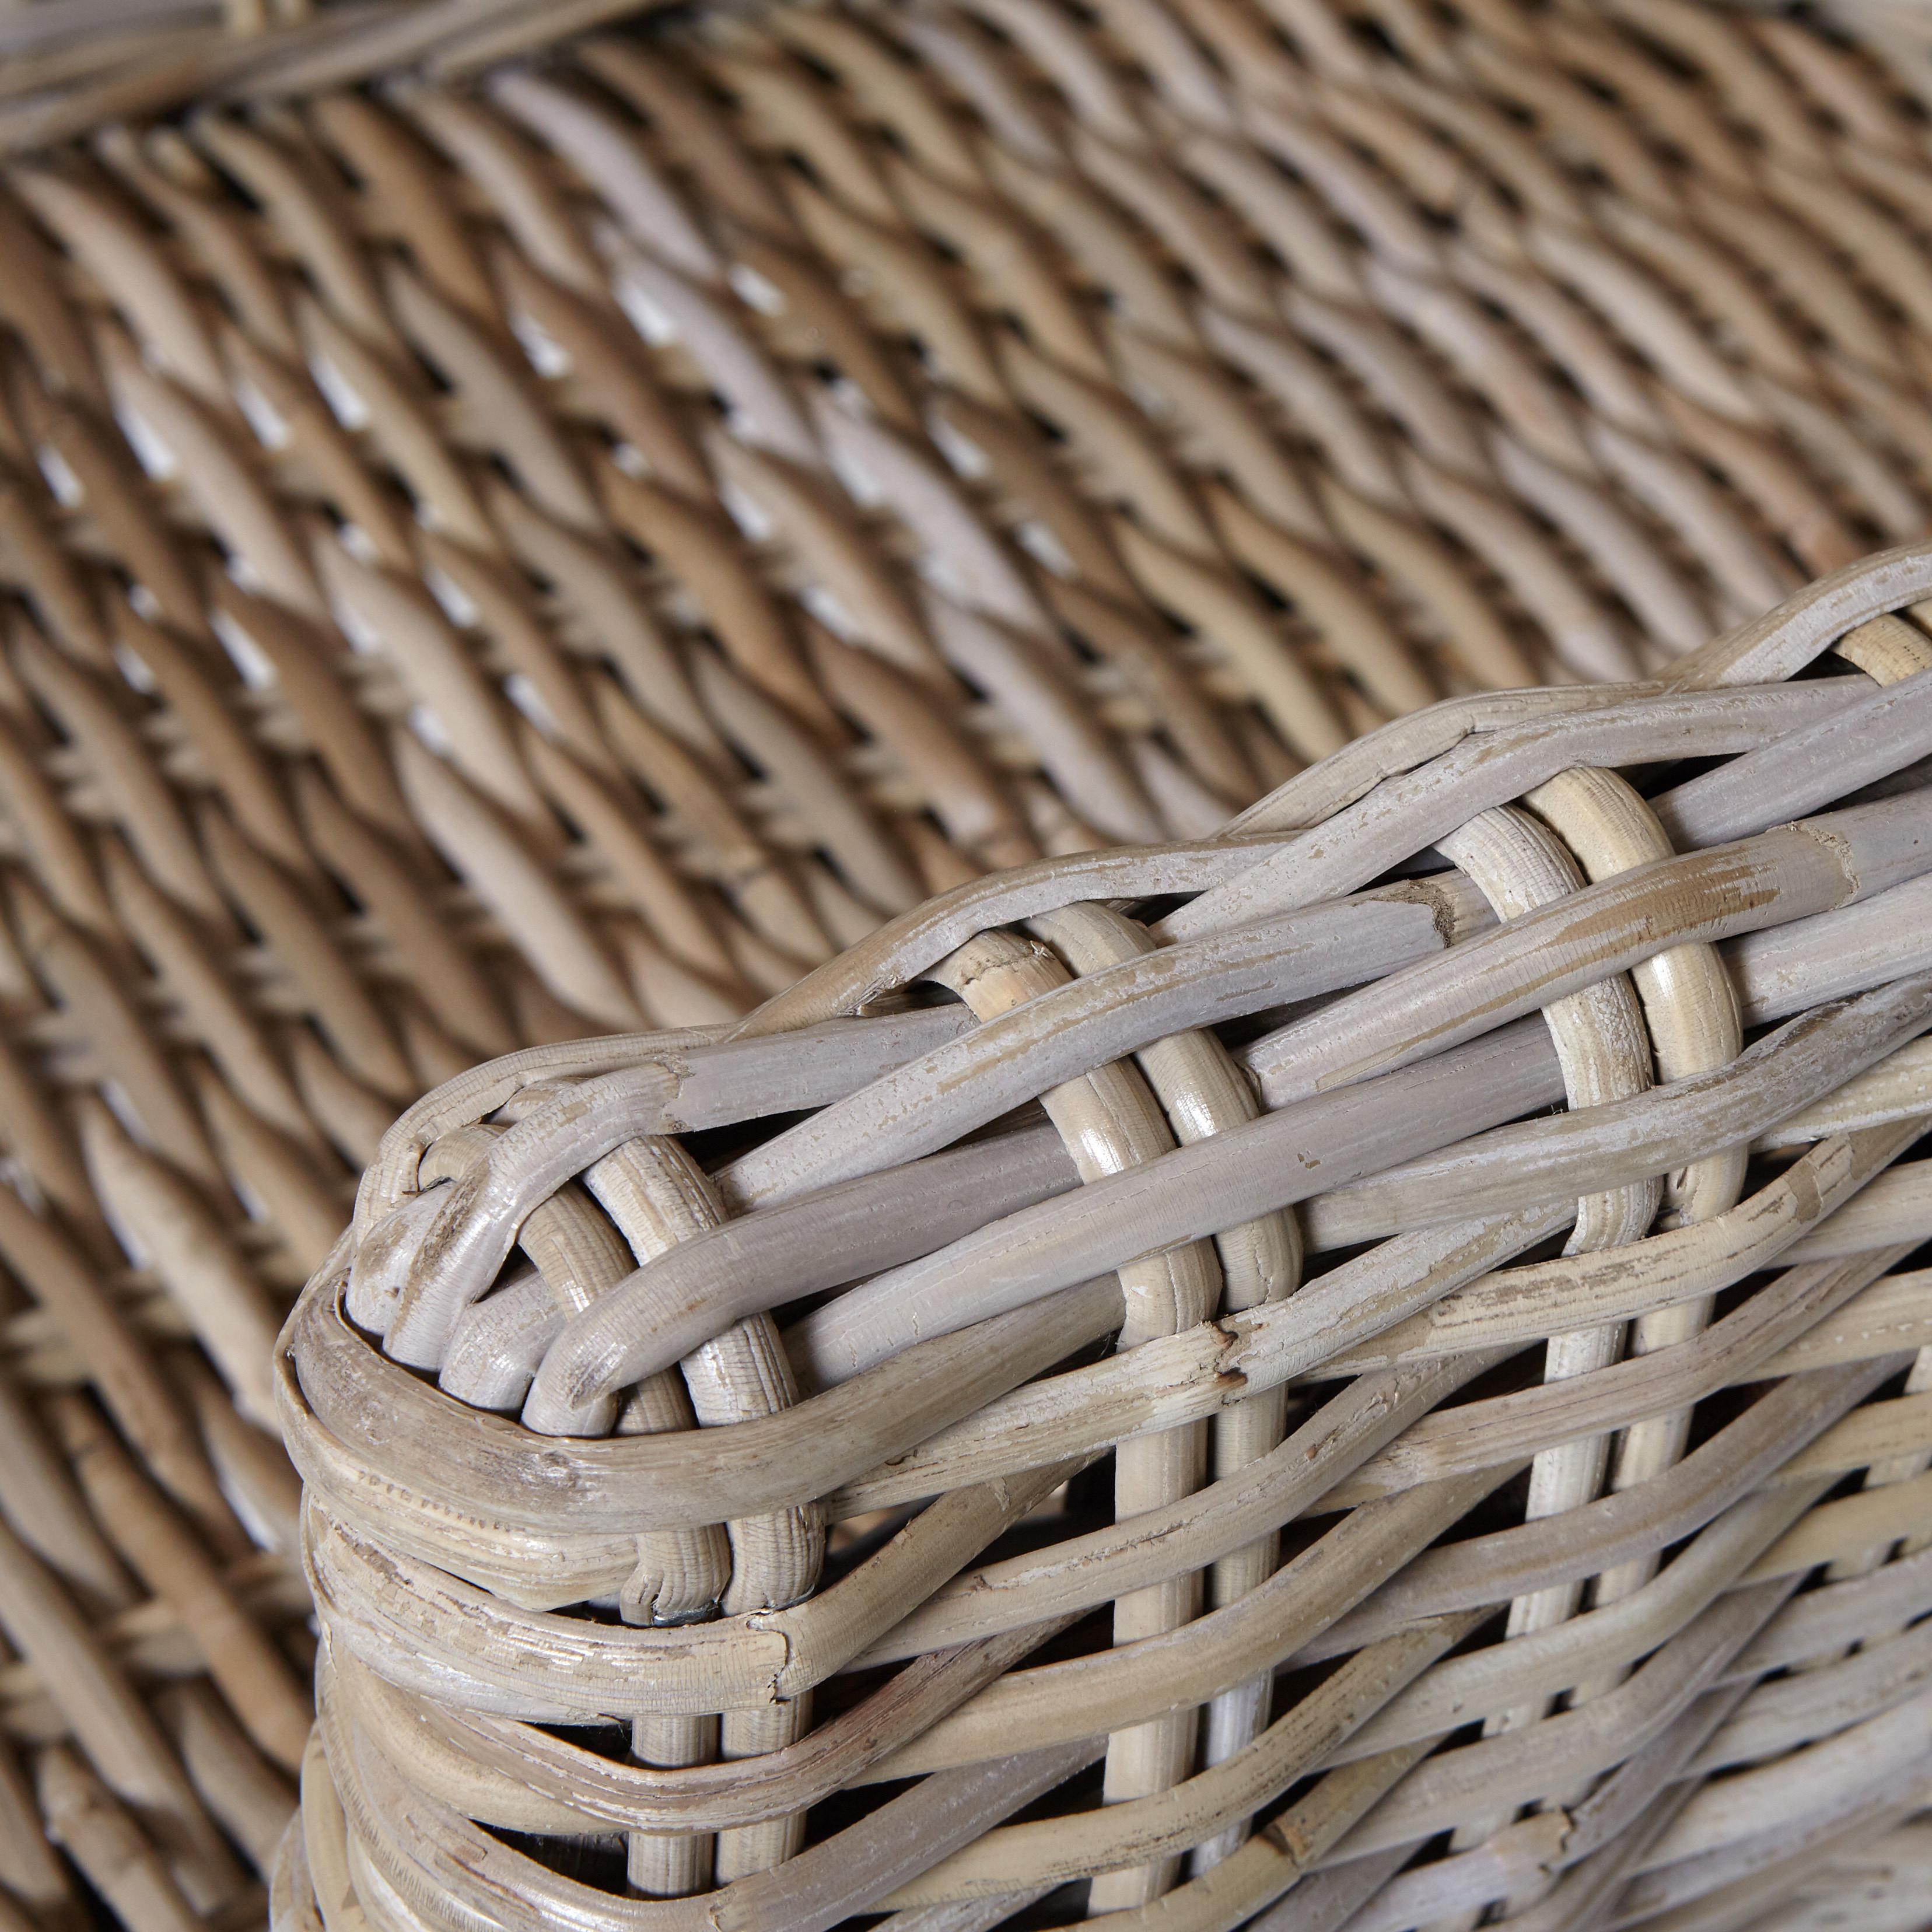 Poltrona rattan intrecciato Bungalow, Beige chiaro, large image number 1